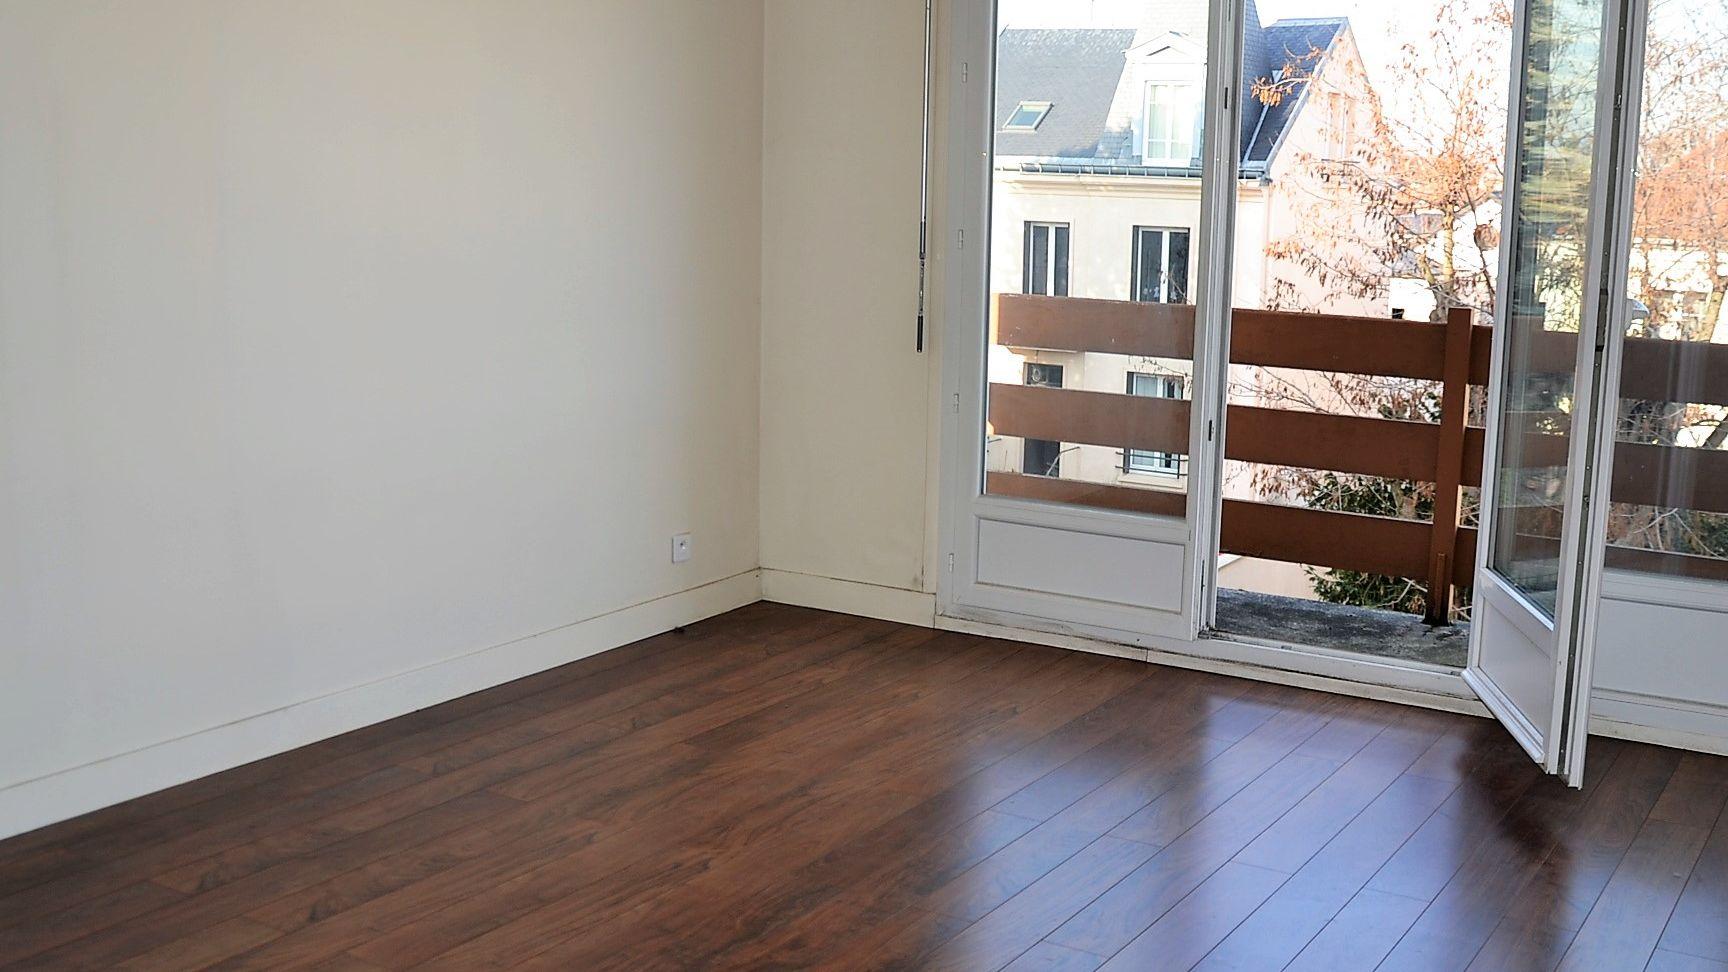 93 rue Jean Jaurès